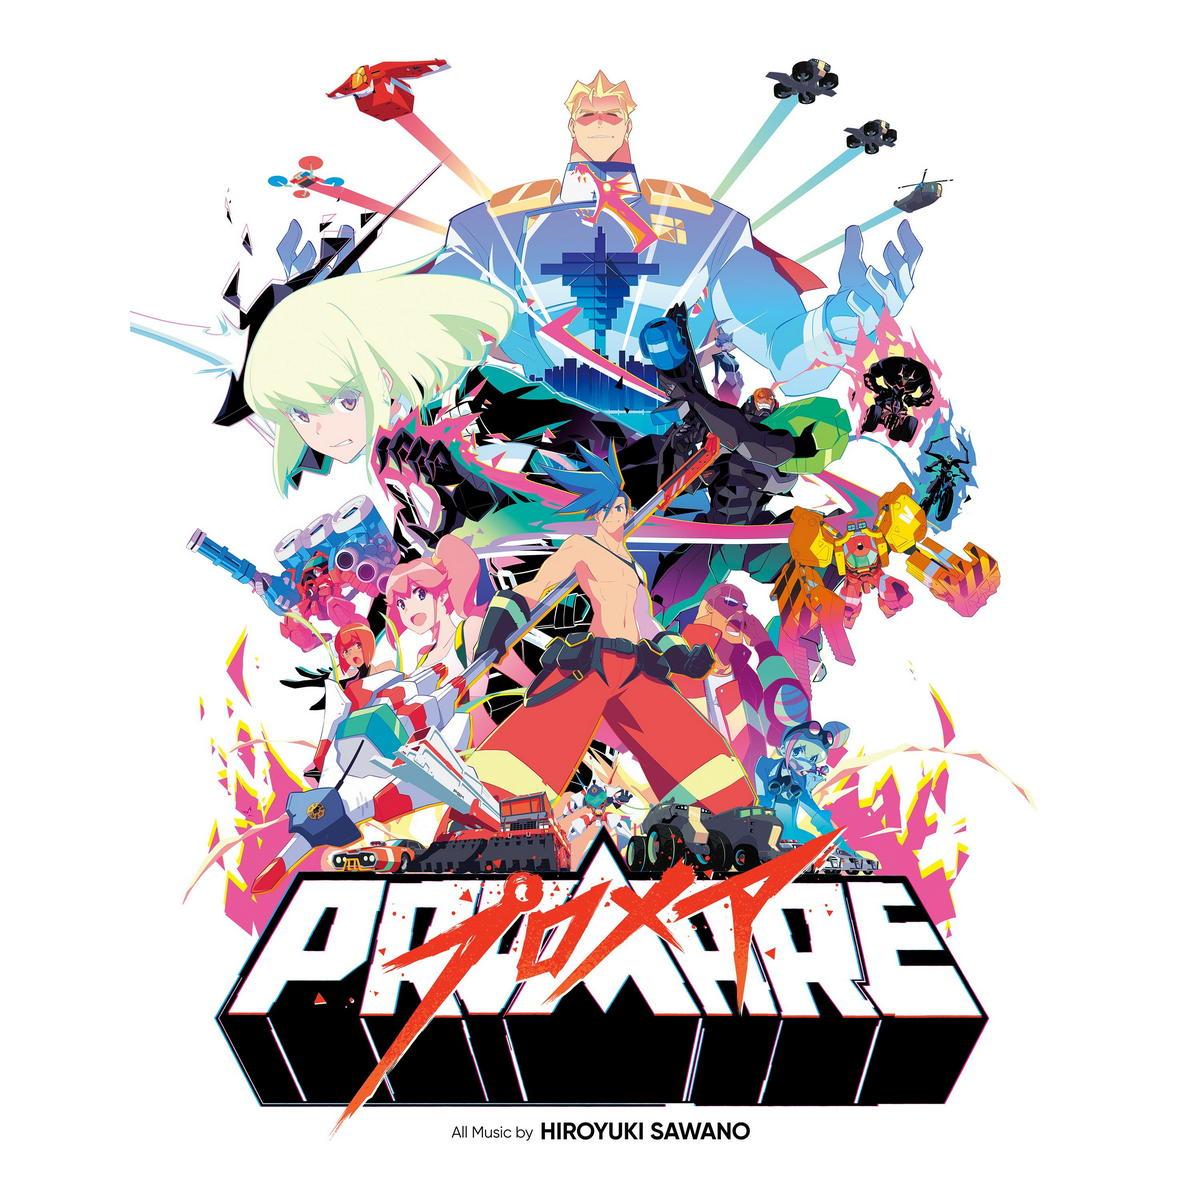 Виниловая пластинка Hiroyuki Sawano - Promare (Original Soundtrack) (Limited Half White Half Red Vinyl)